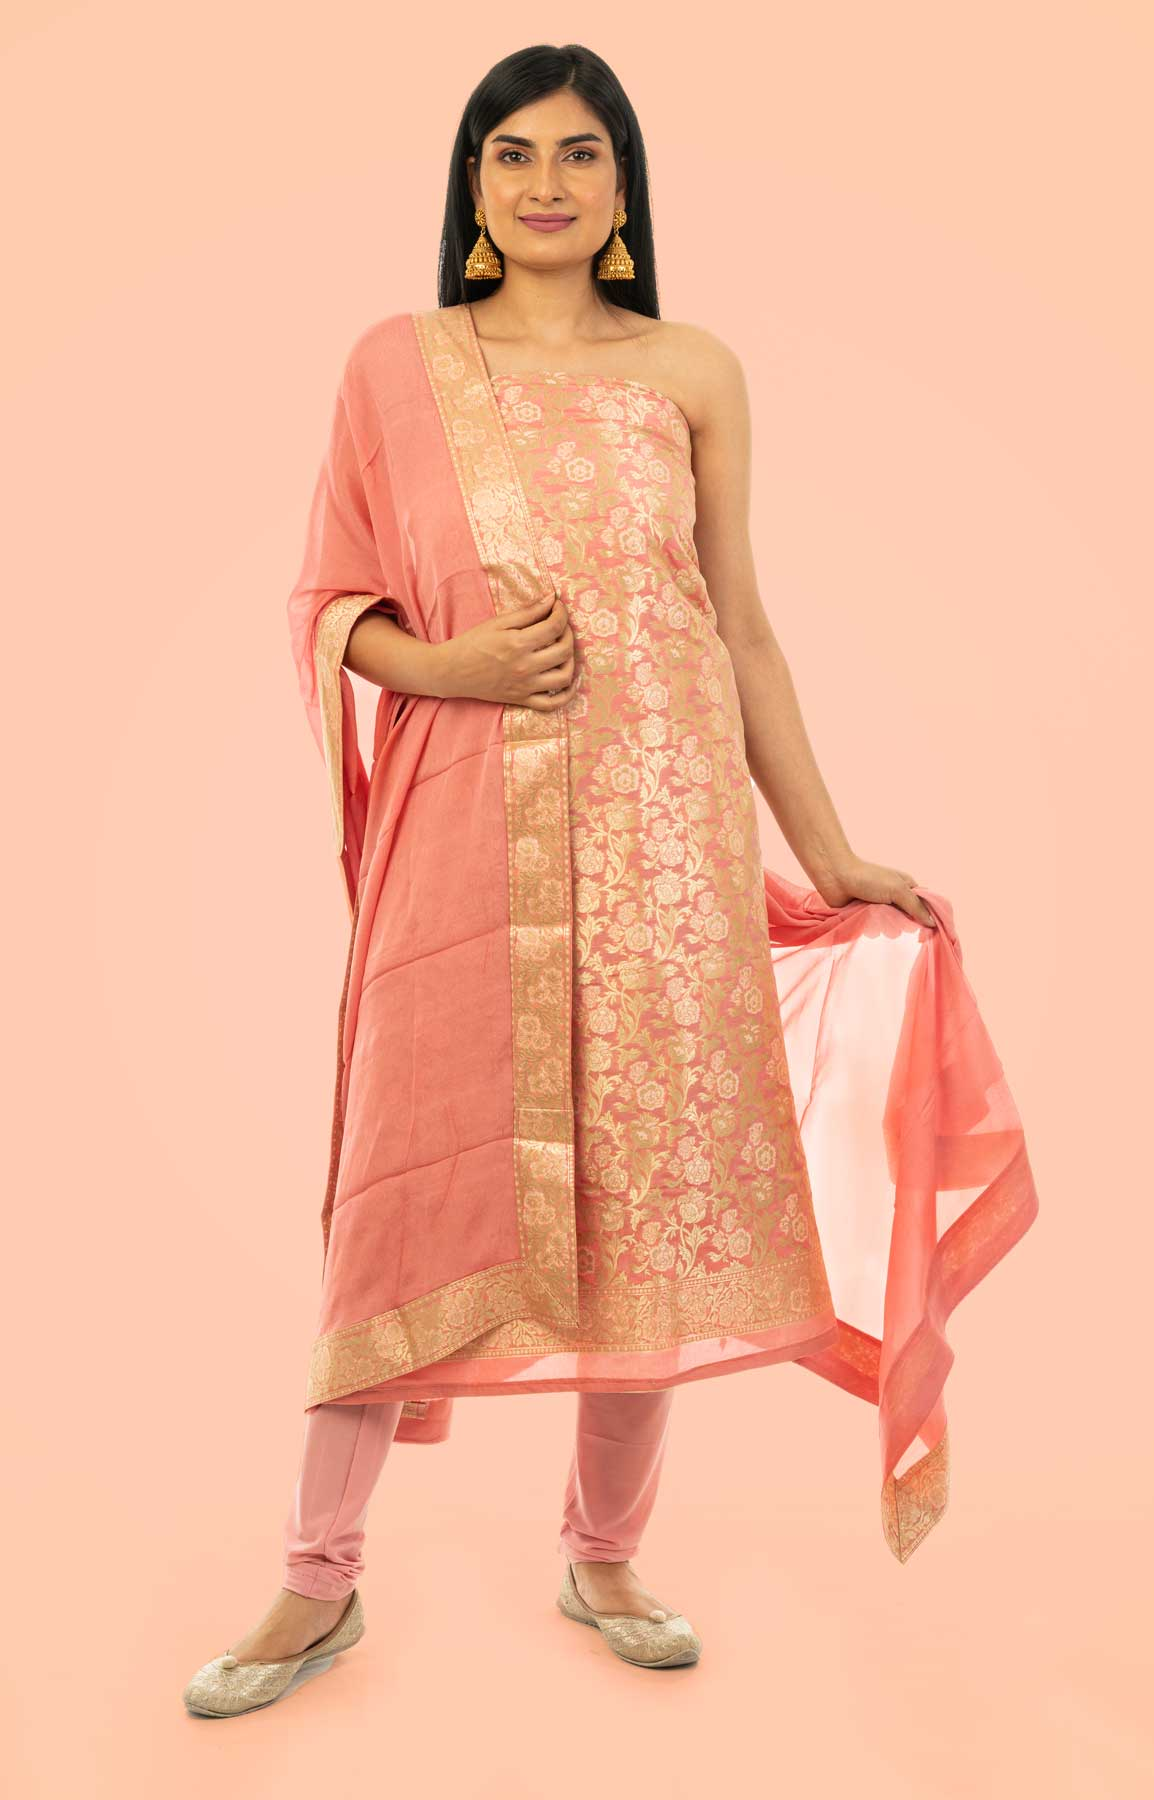 Pink Banarasi Brocade Unstitched Suit With Chiffon Dupatta – Viraaya By Ushnakmals